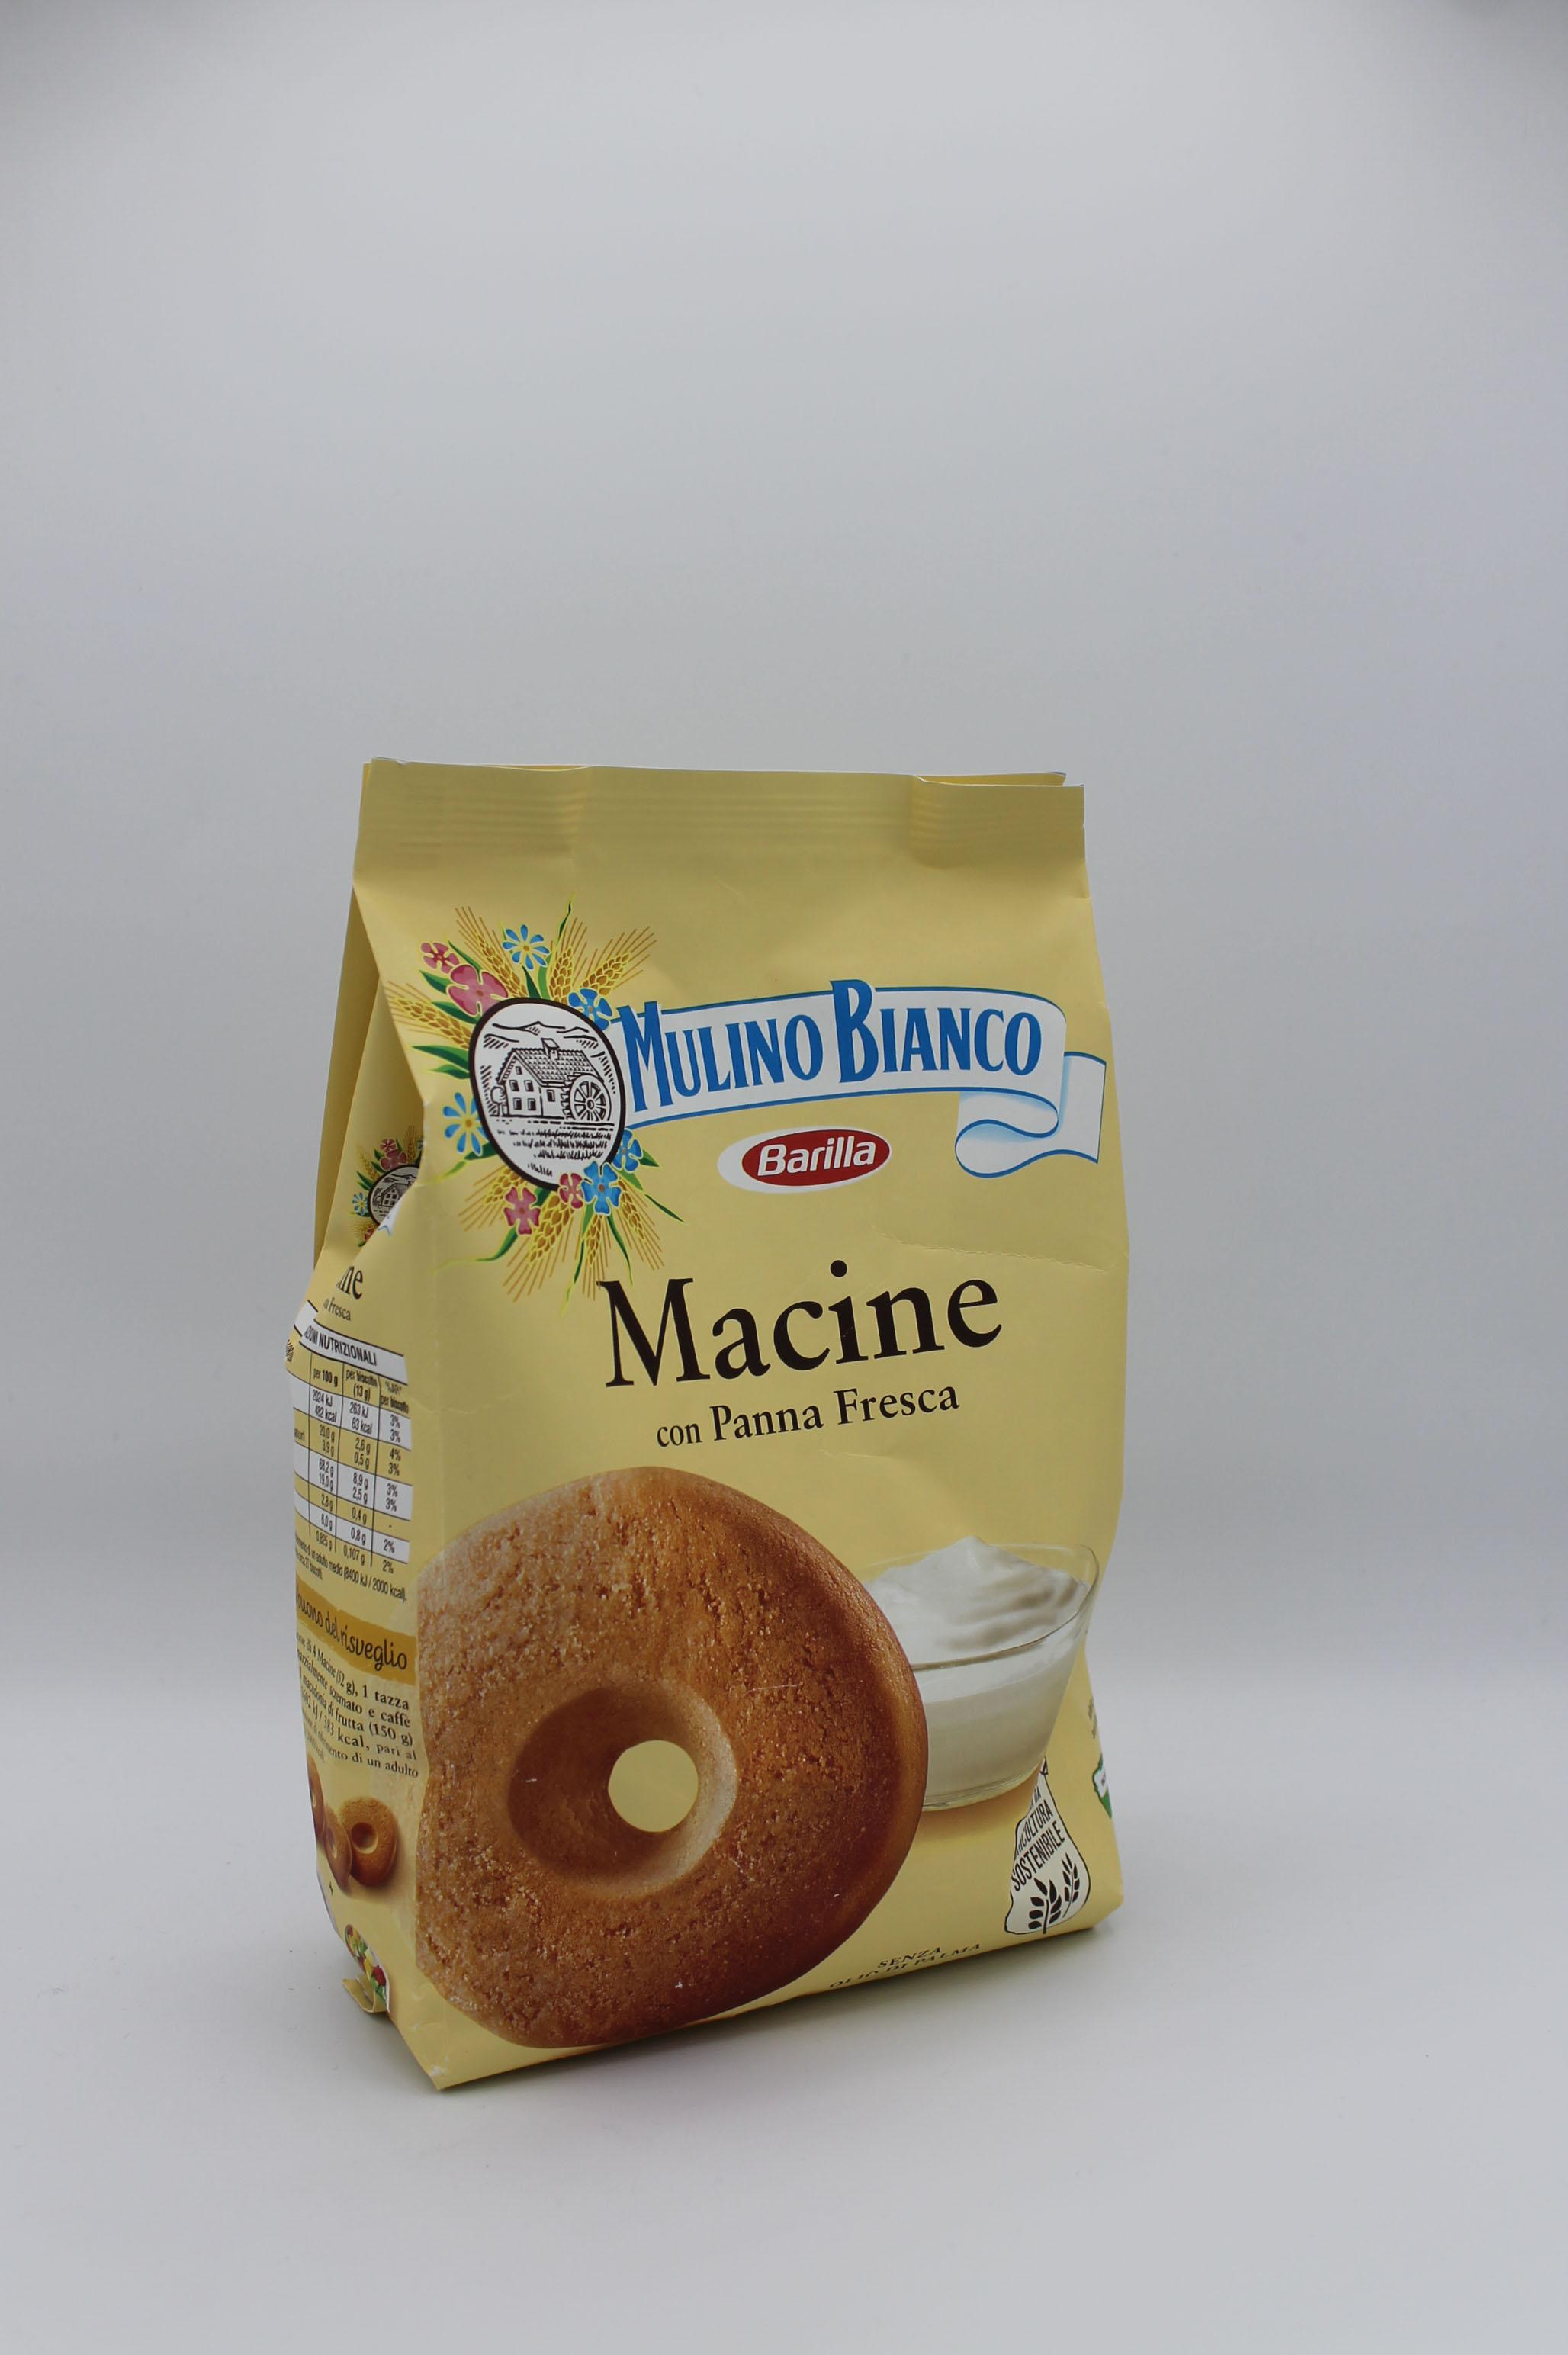 Mulino bianco biscotti barilla 350 gr vari gusti.